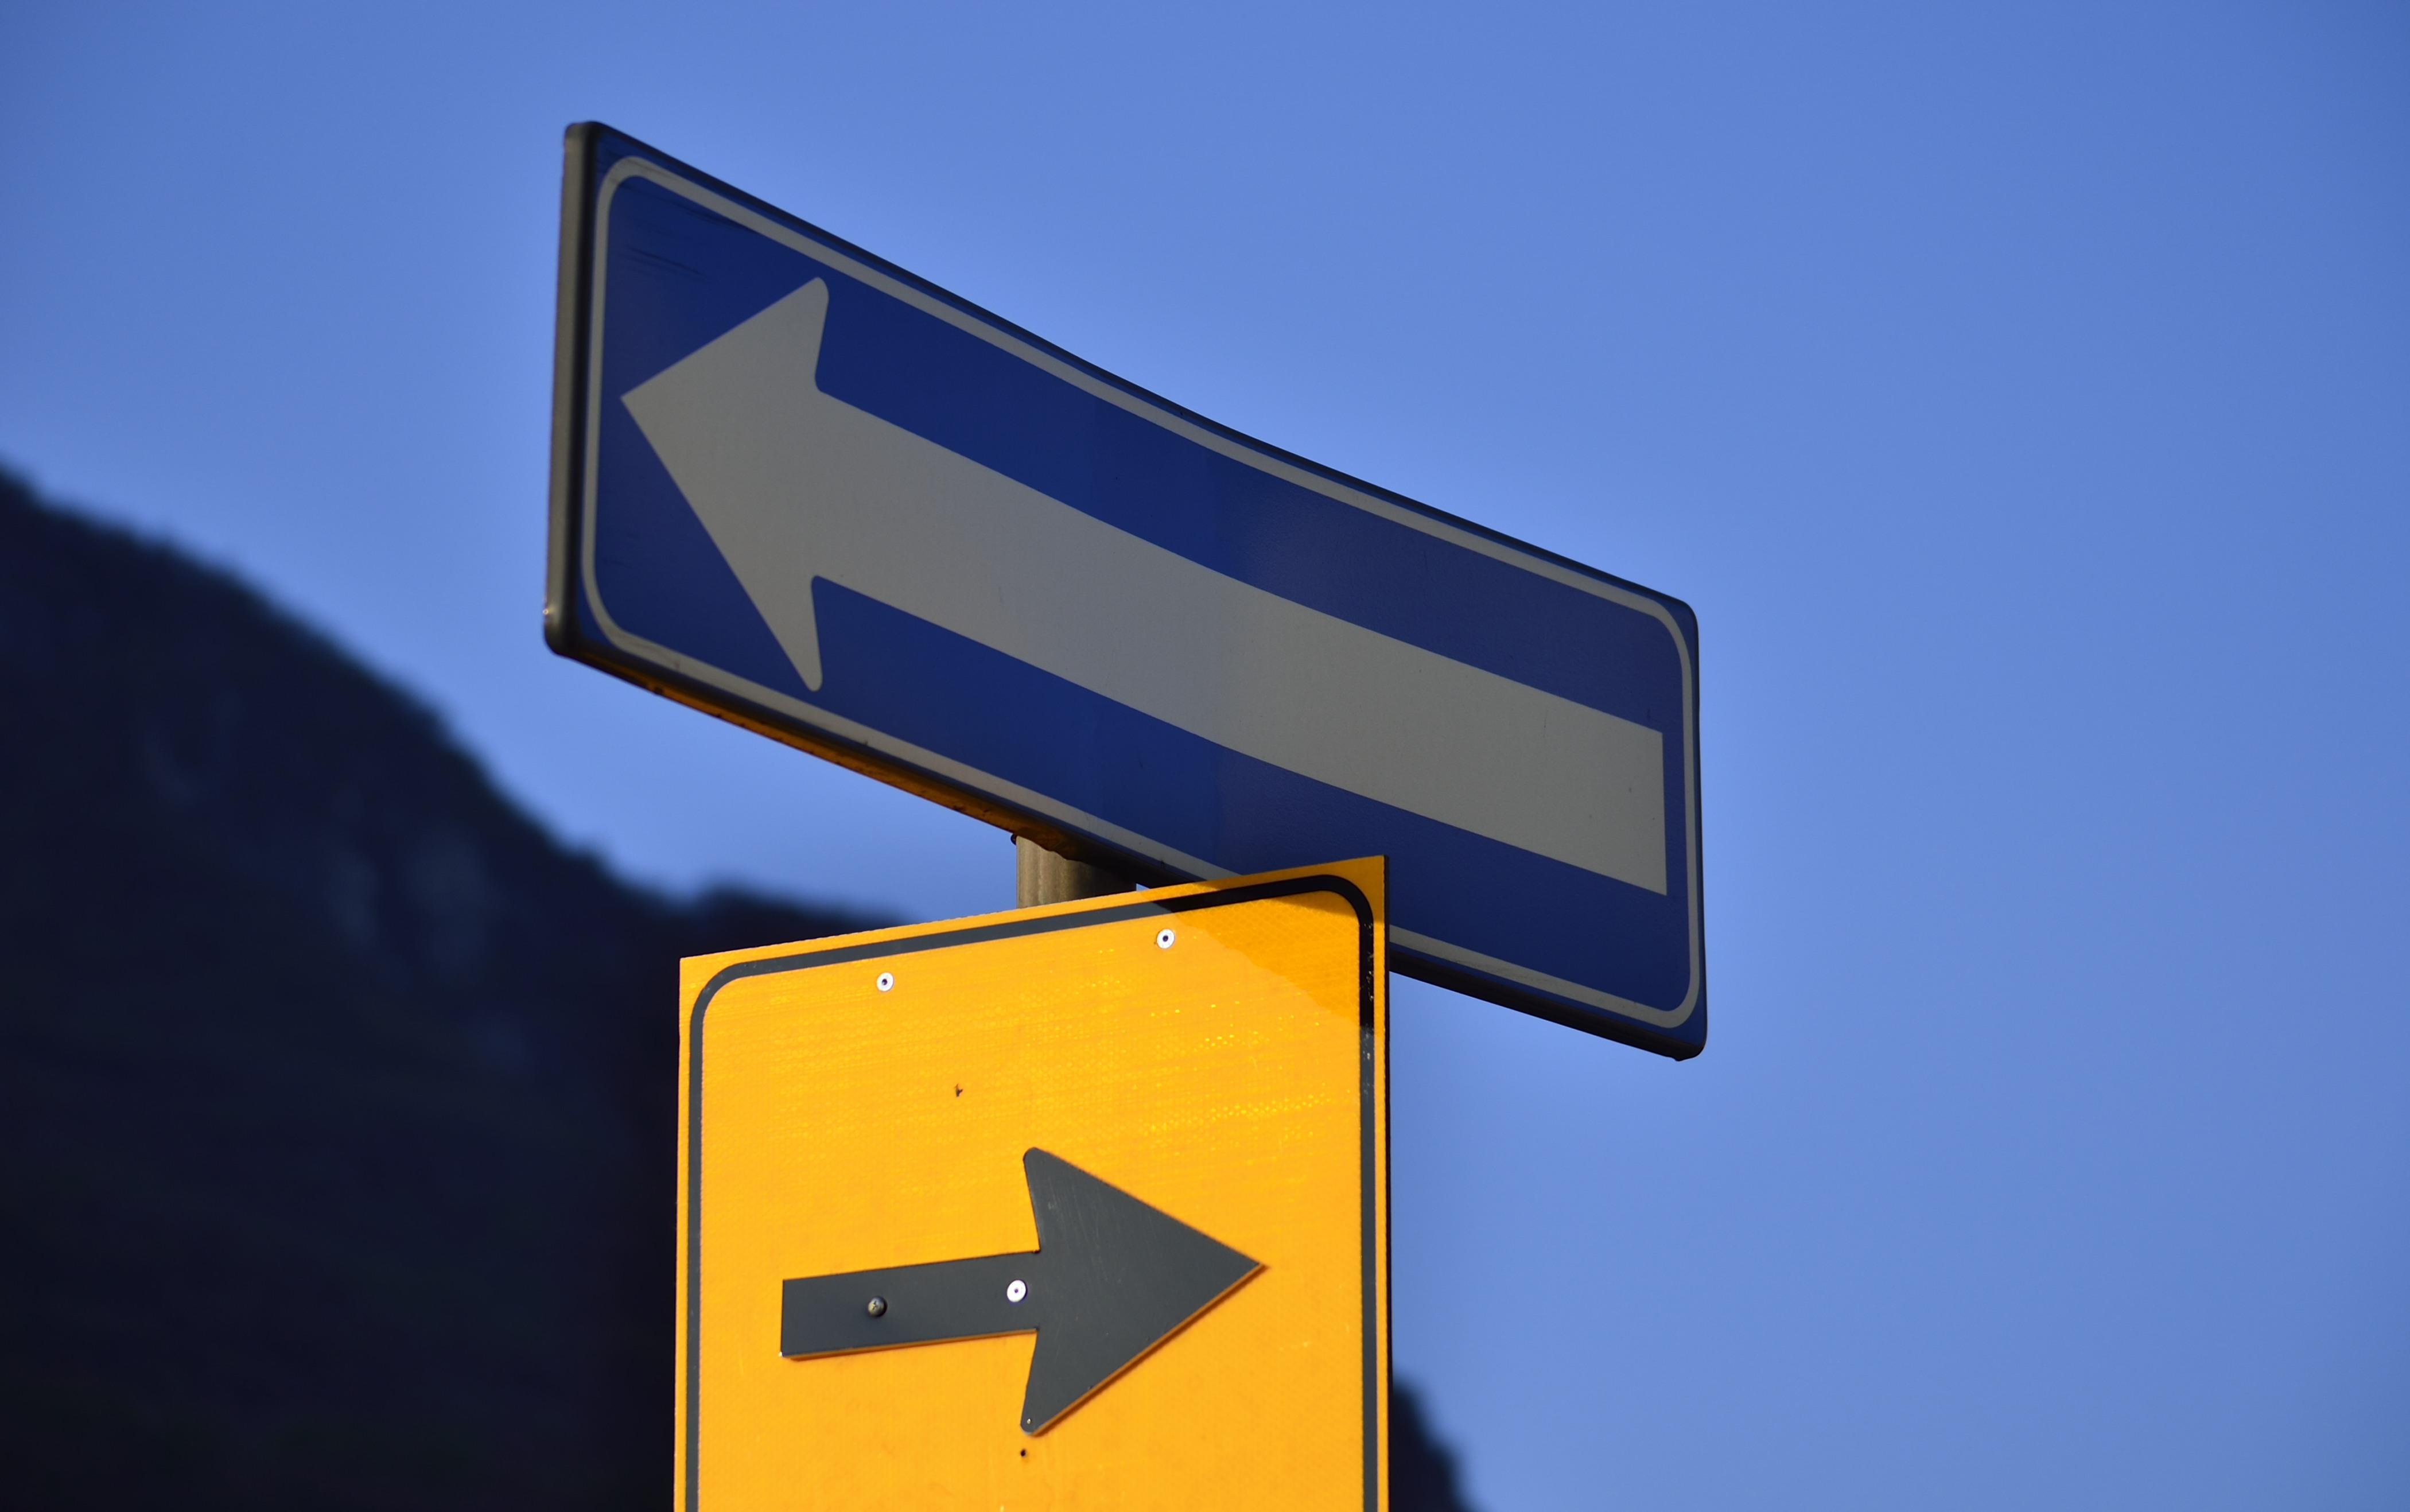 Destra o sinistra?